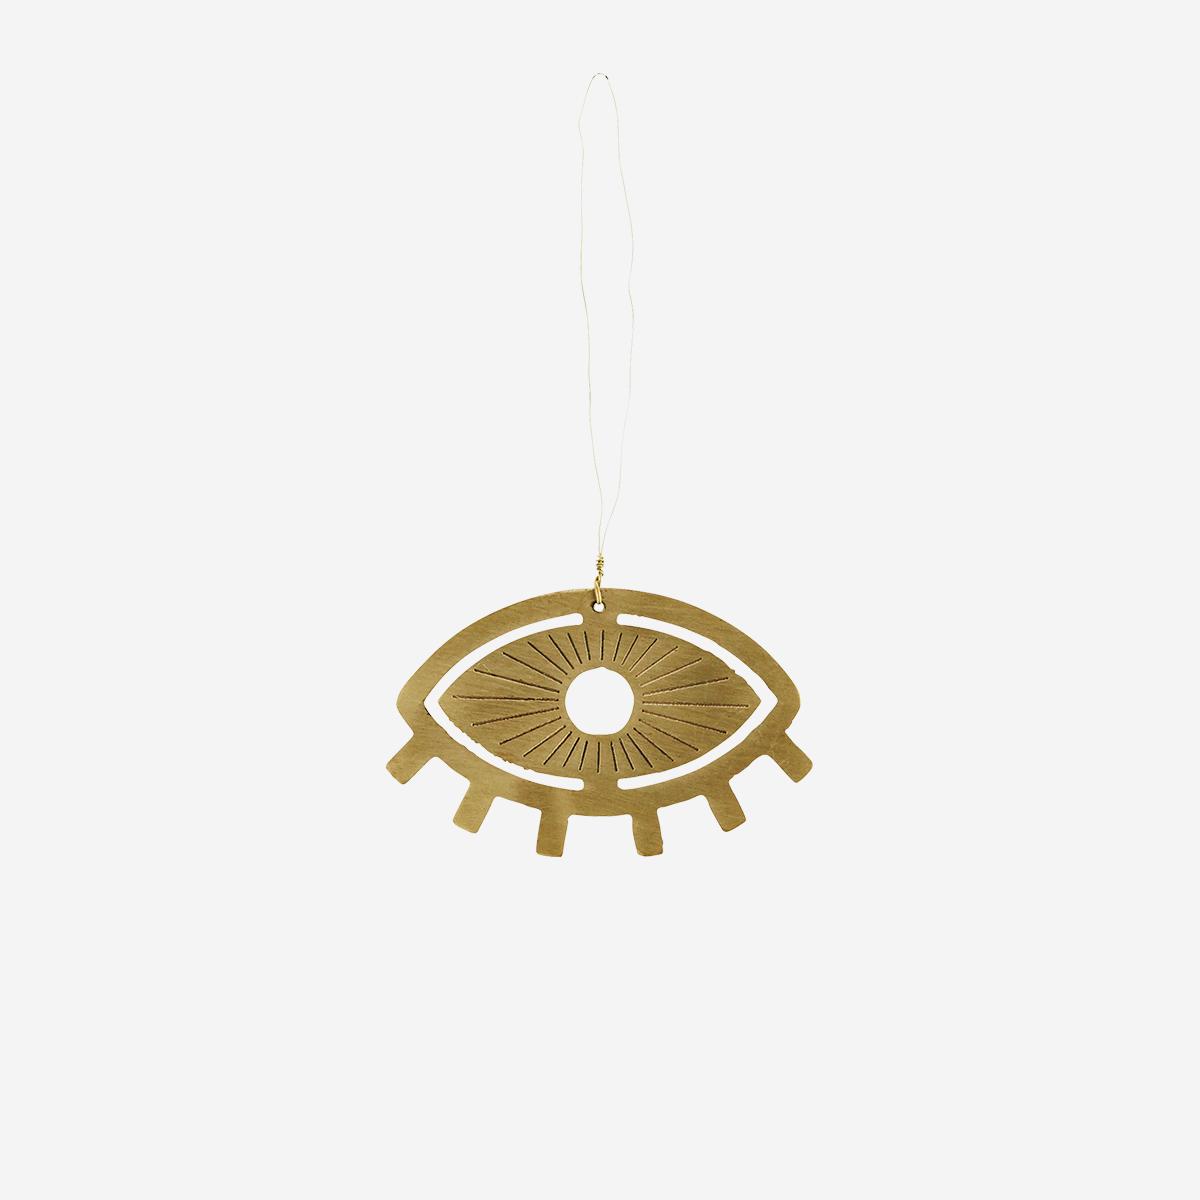 Hanging Brass Eye Ornament by Madam Stoltz